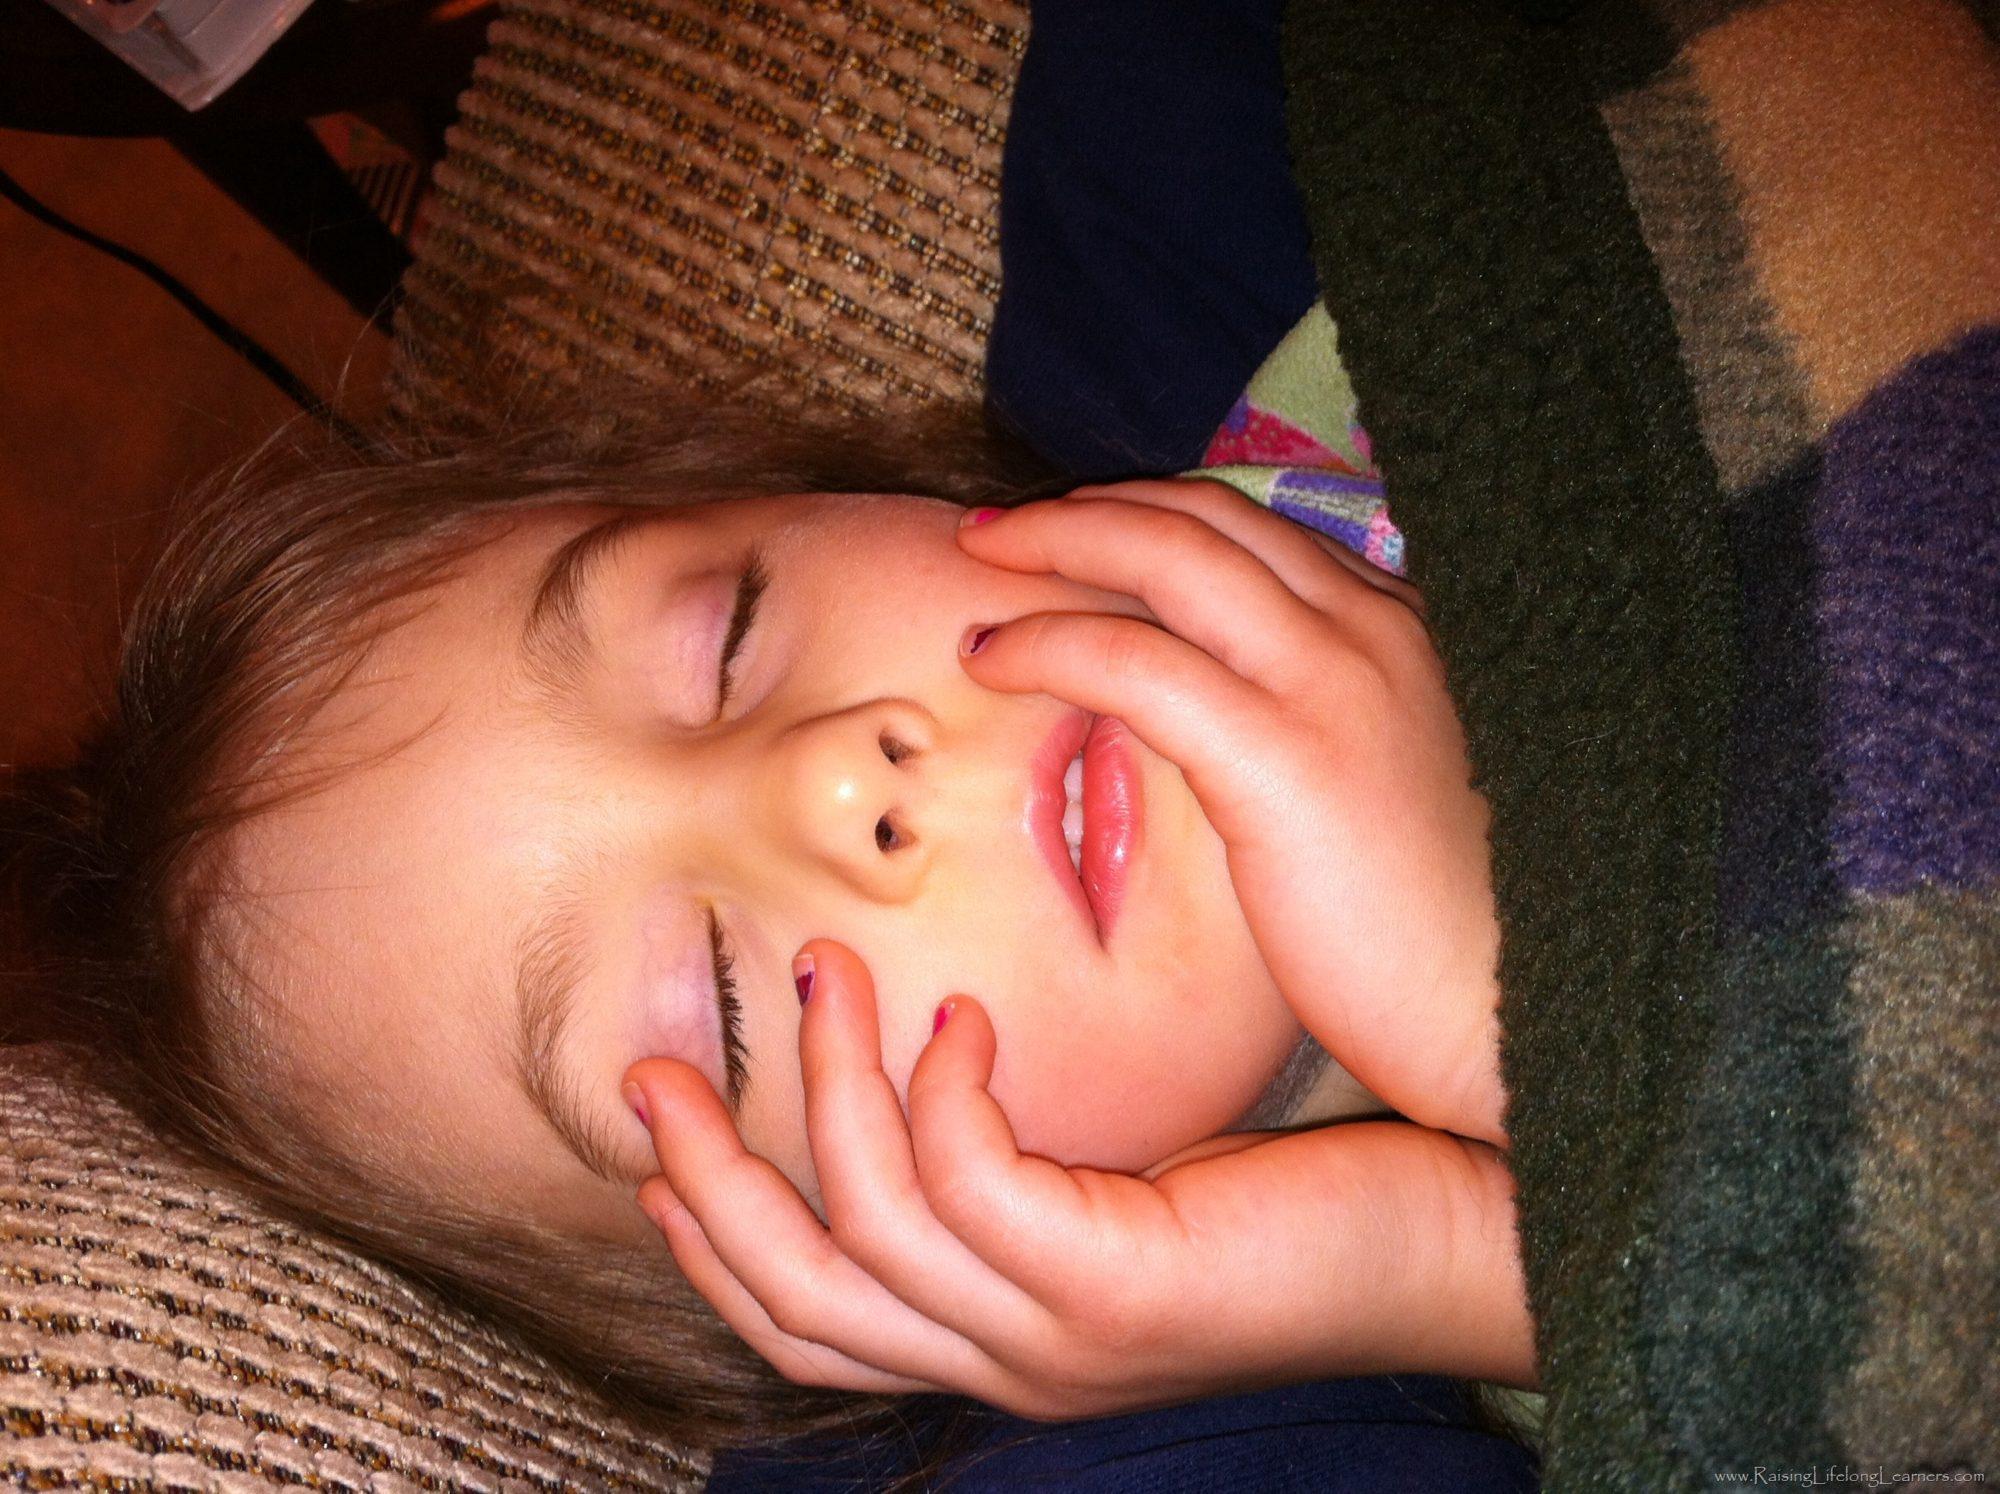 Do Gifted Children Need Less Sleep